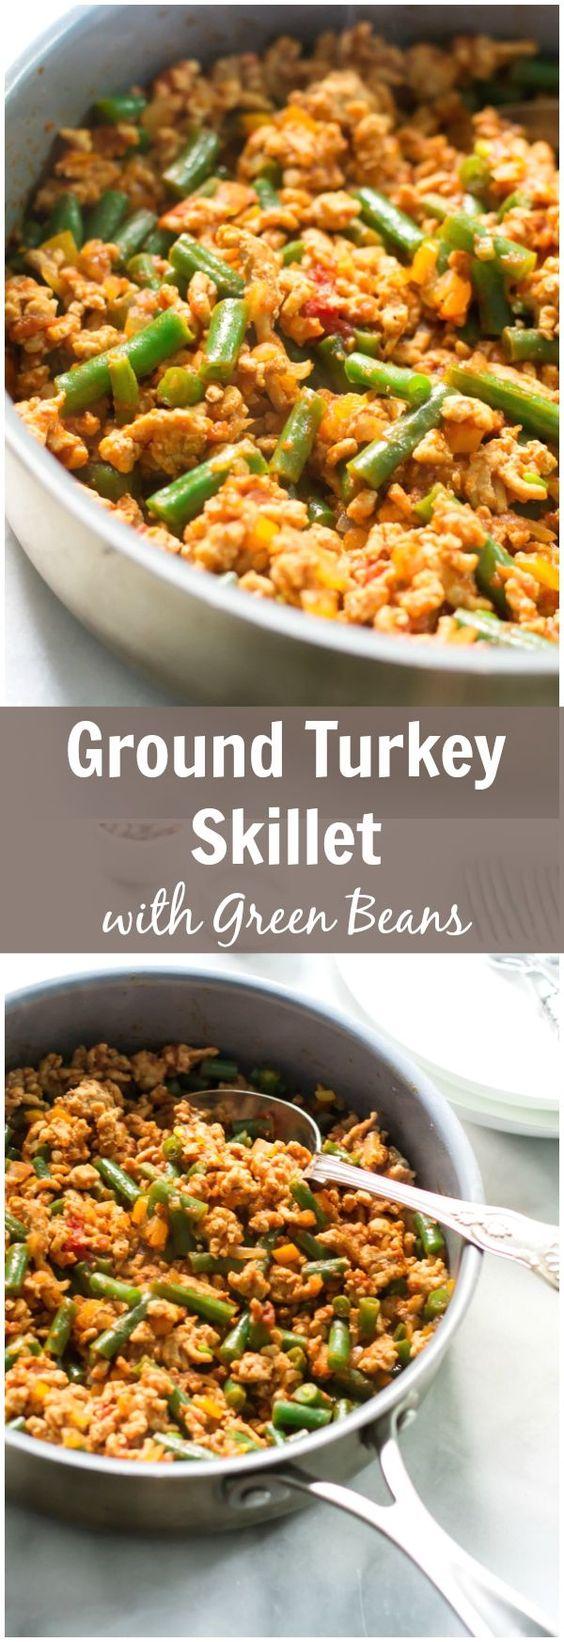 Ground Turkey Skillet With Green Beans